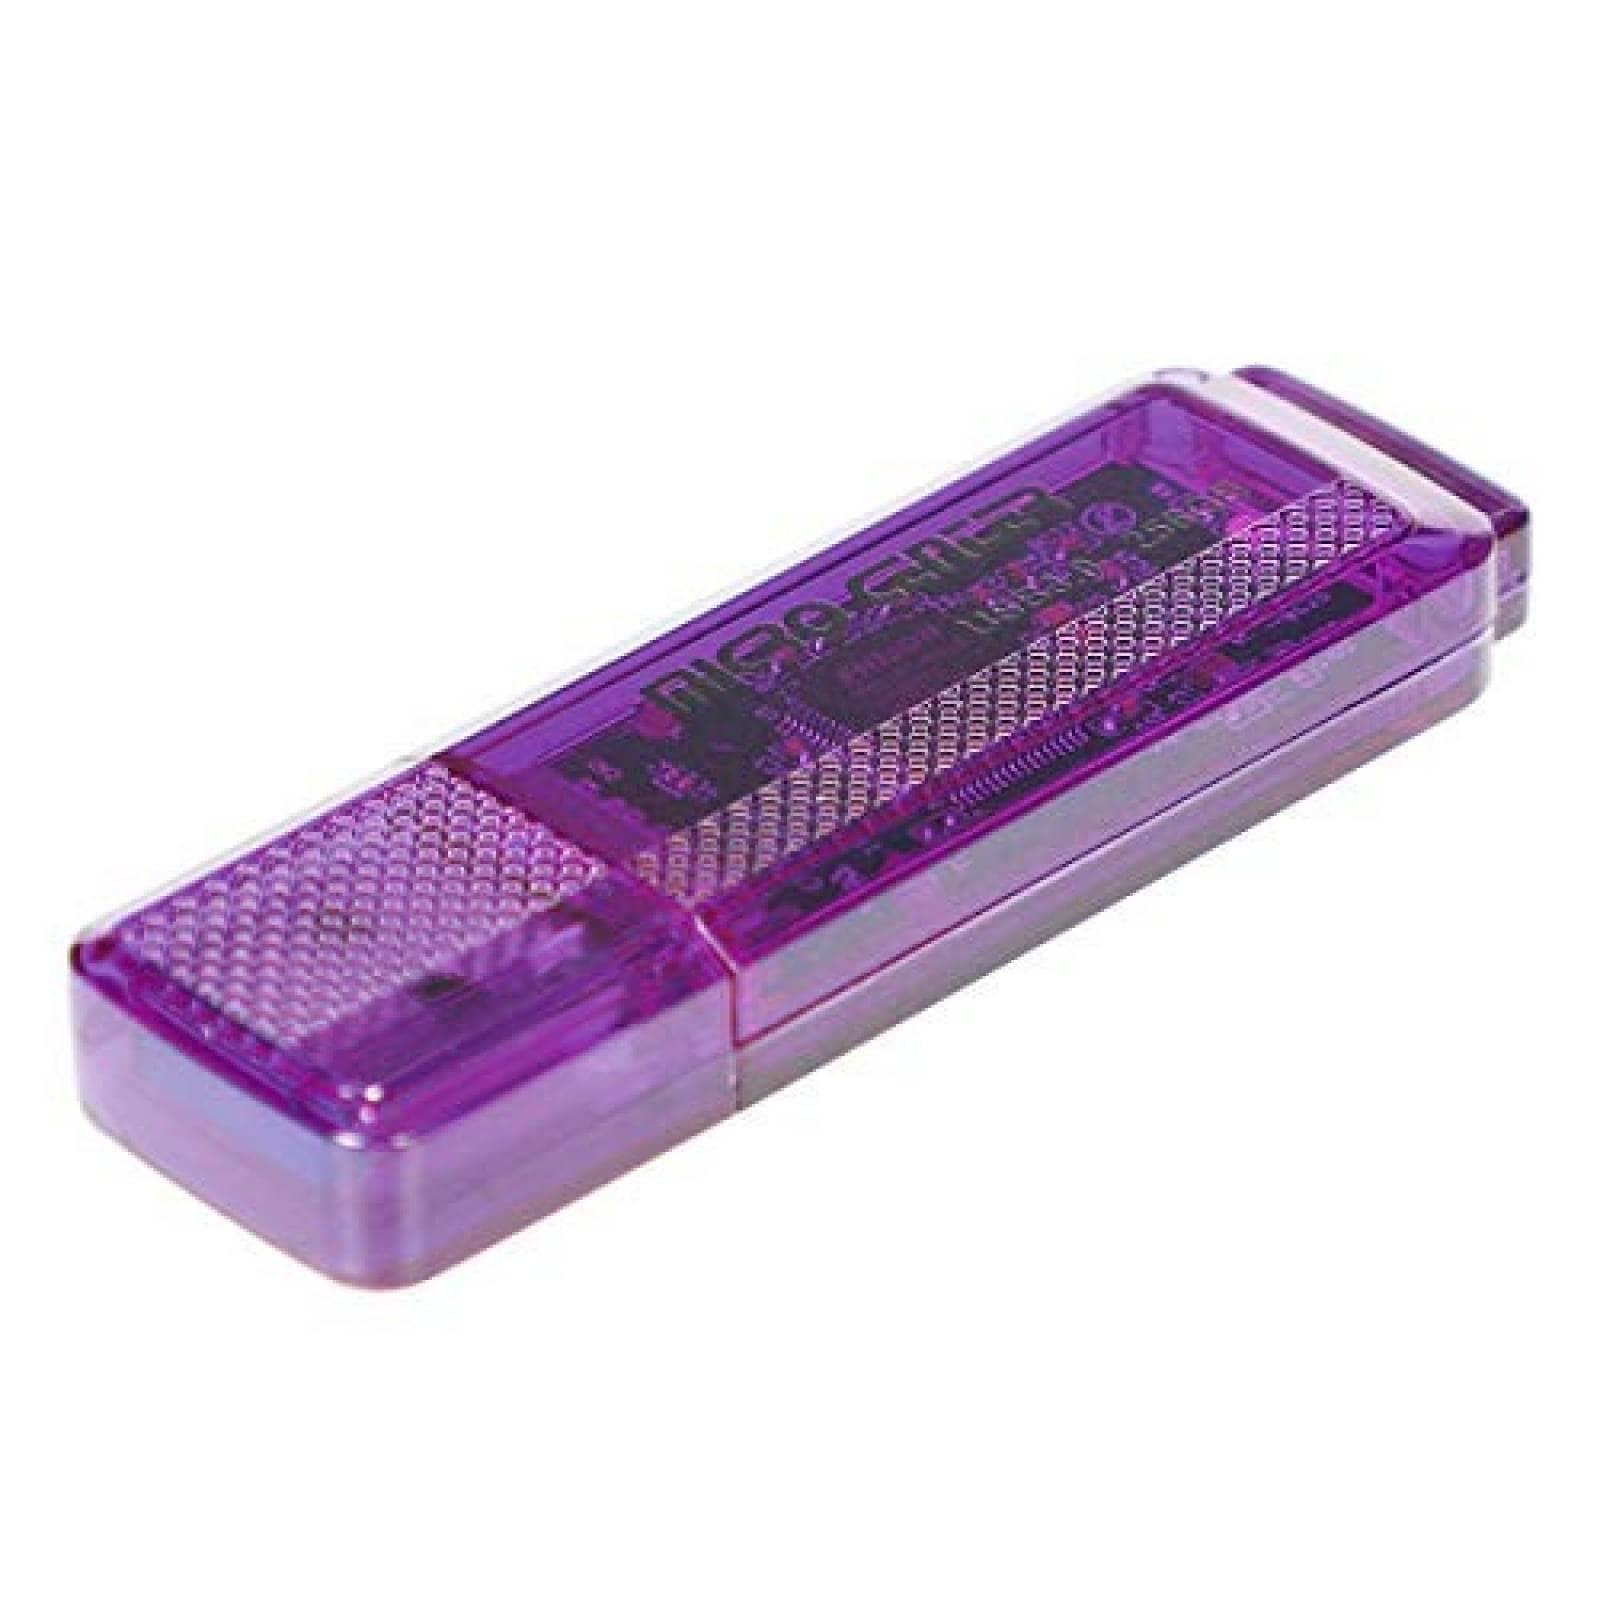 Memoria USB Inland Micro Center SuperSpeed 256GB USB 3.0